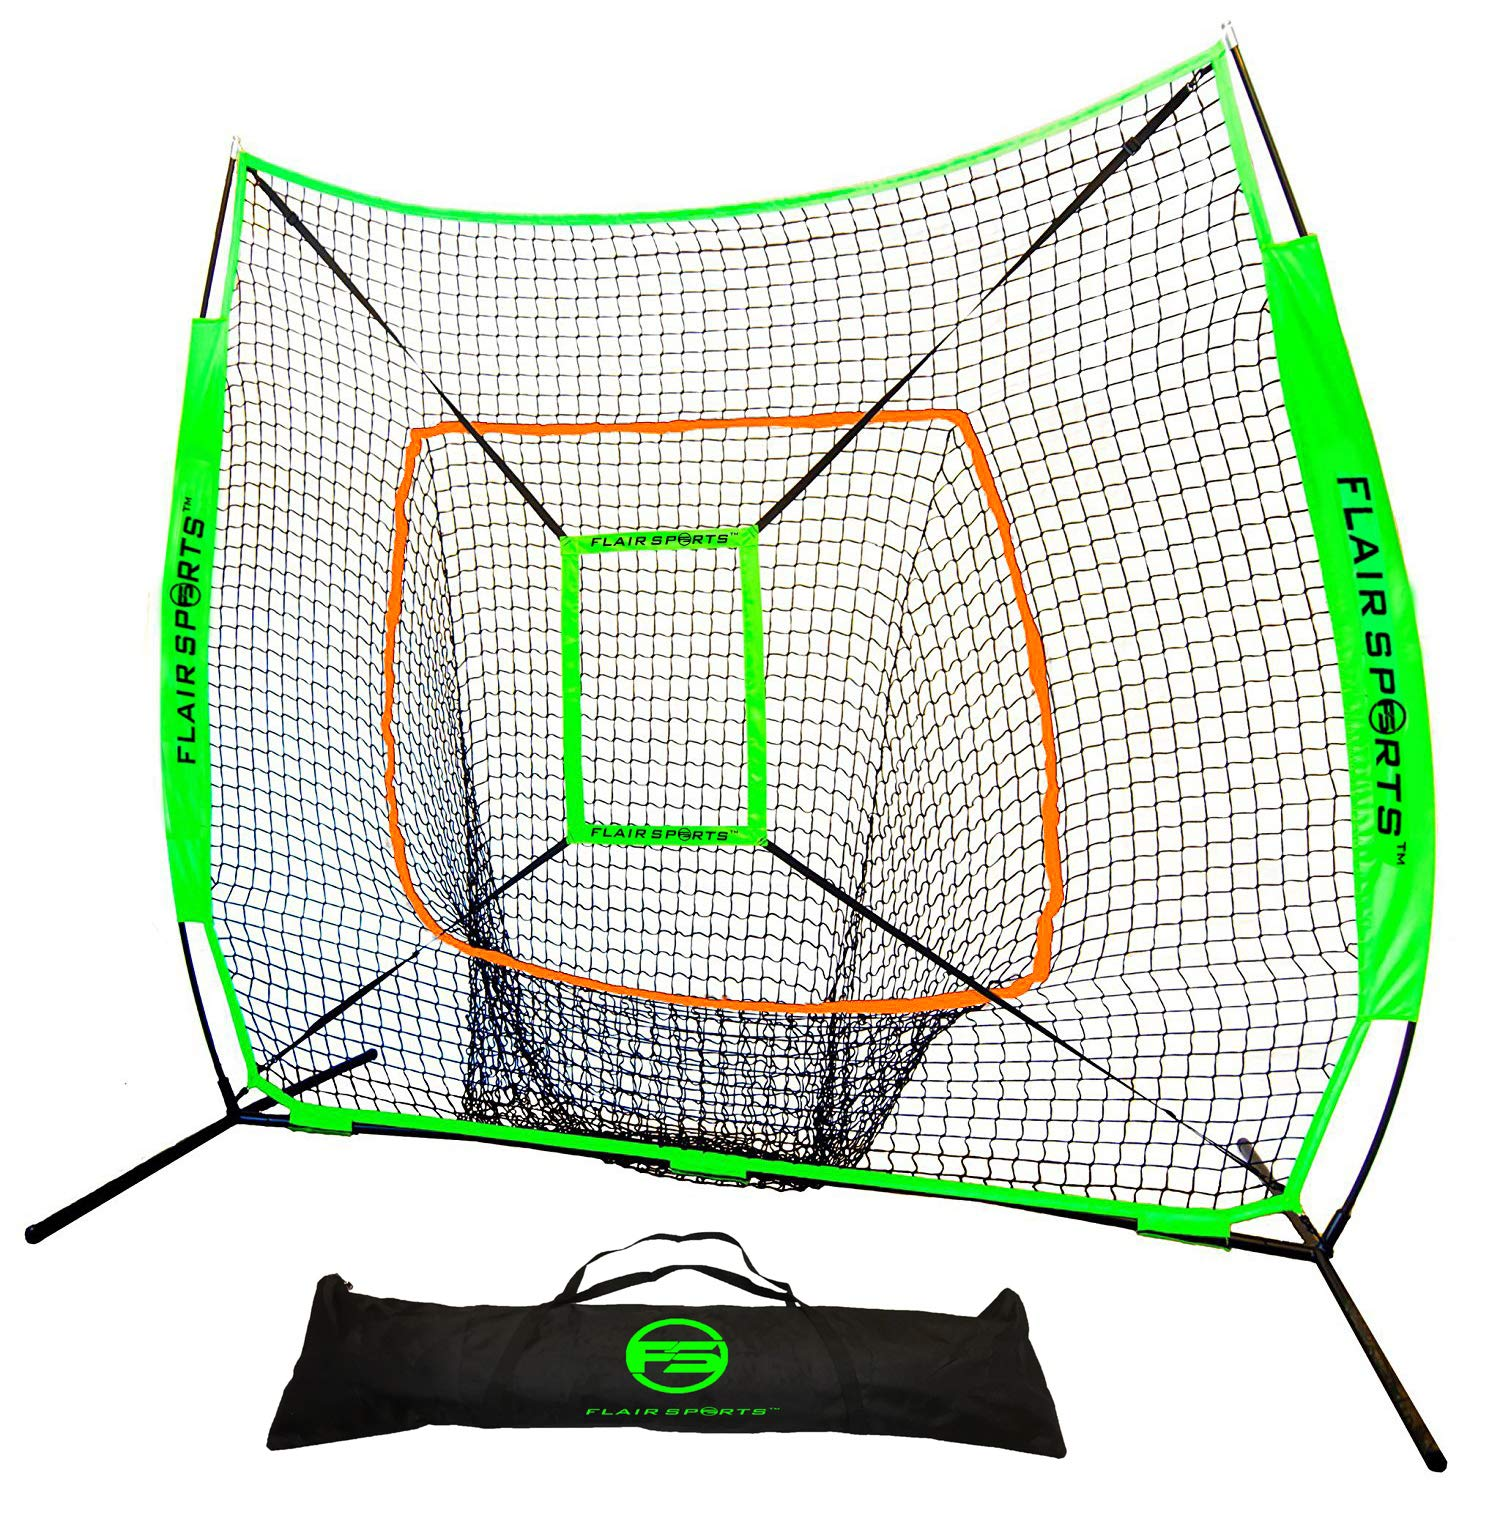 Flair Sports Baseball & Softball Net for Hitting & Pitching Heavy Duty 7x7 Pro Series | Indoor & Outdoor Training Net | Bow Frame + Bonus Strike Zone Included (Neon Green, Neon Orange)